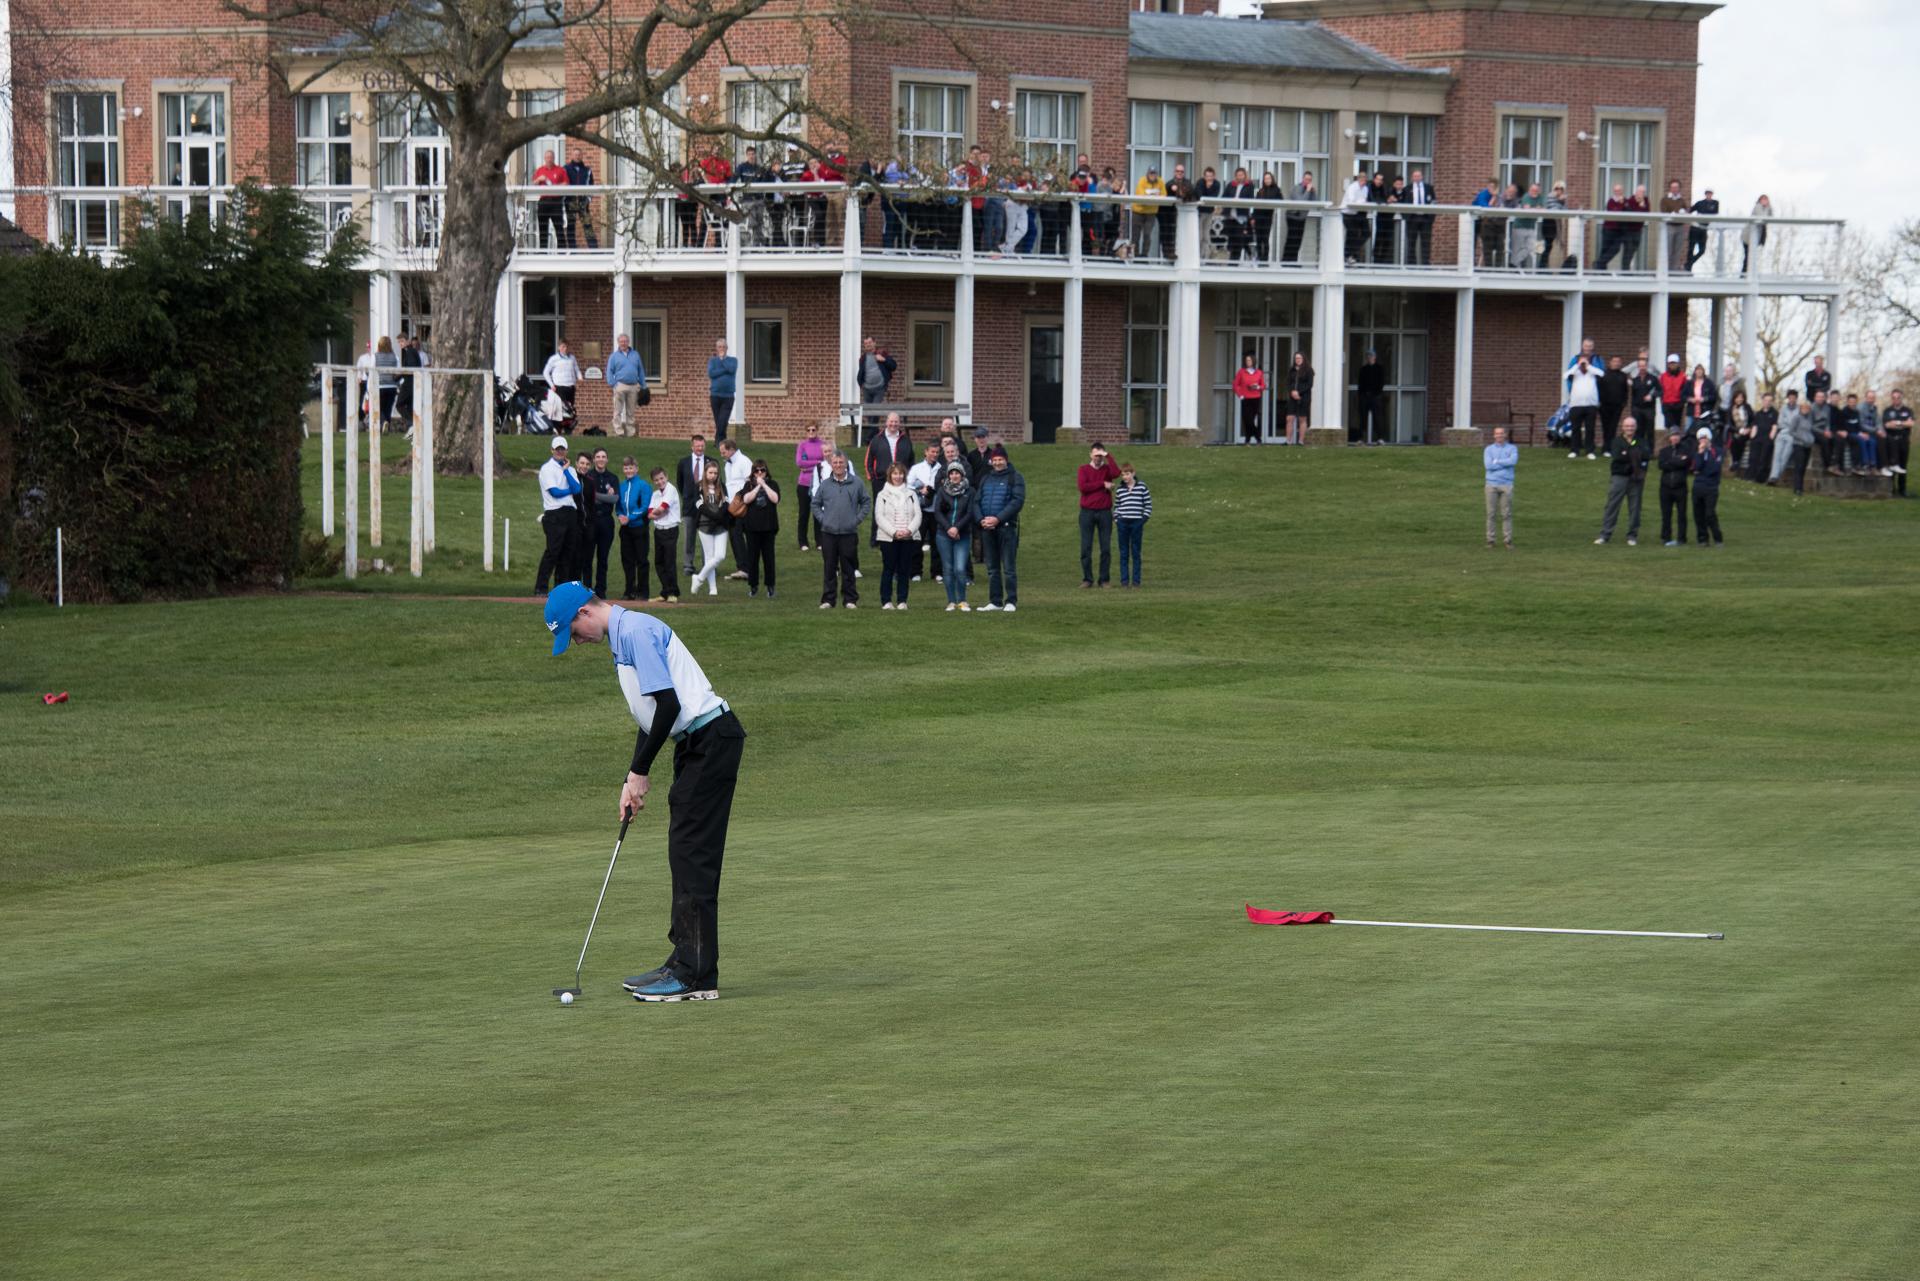 Kevindiss.com golf course photography Hawkstone Park golf course-2837.jpg